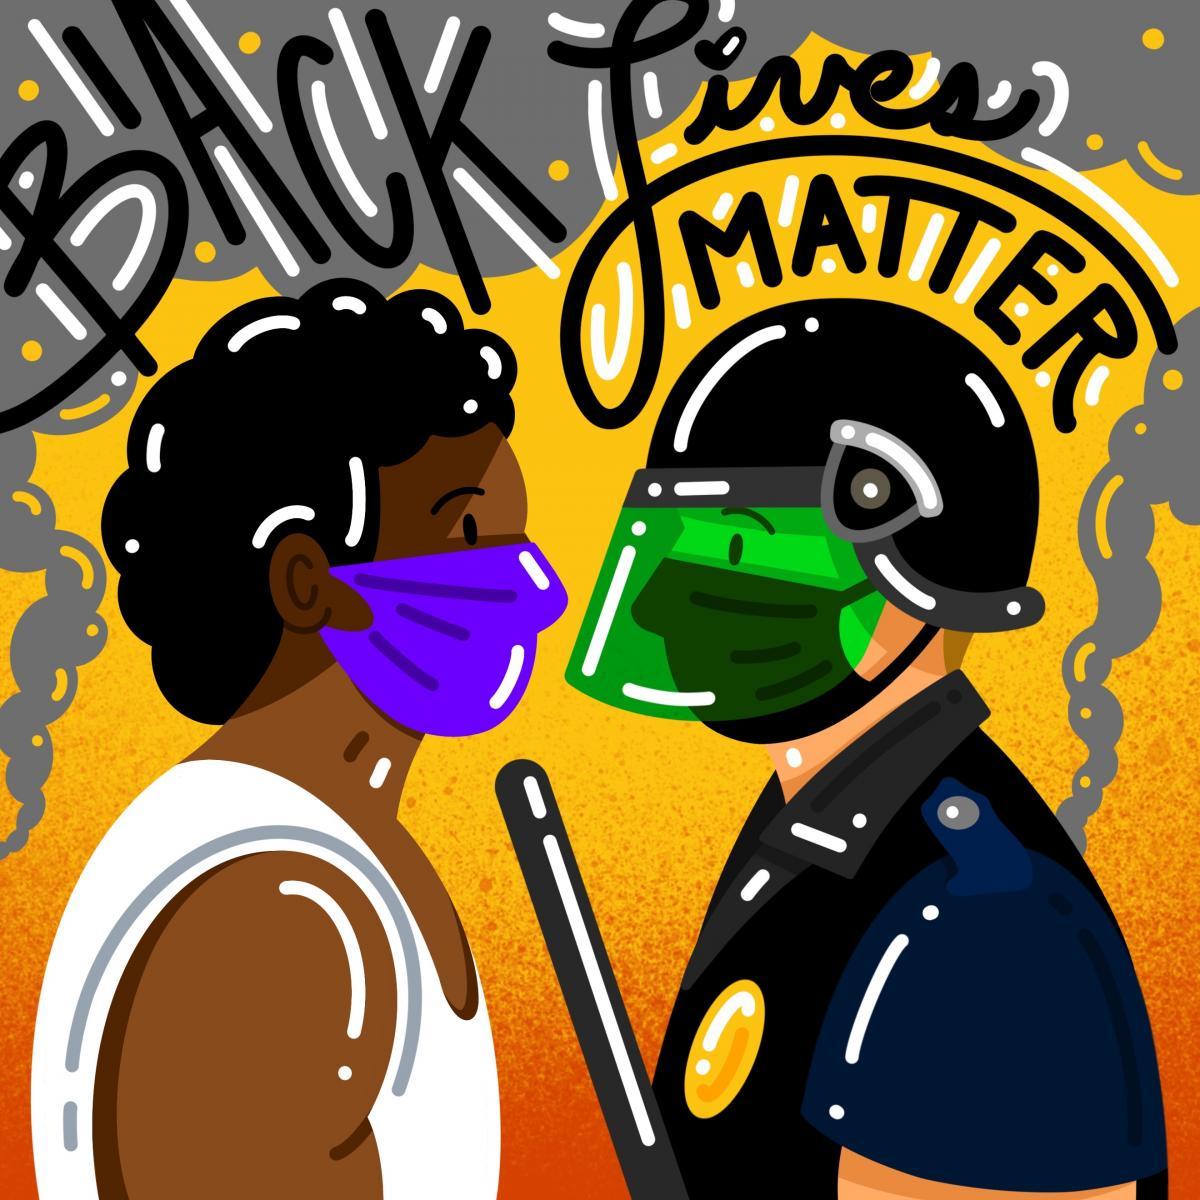 Black lives matter artwork of masked protester confronting police by Bryant Santamaria (Ryman '12)